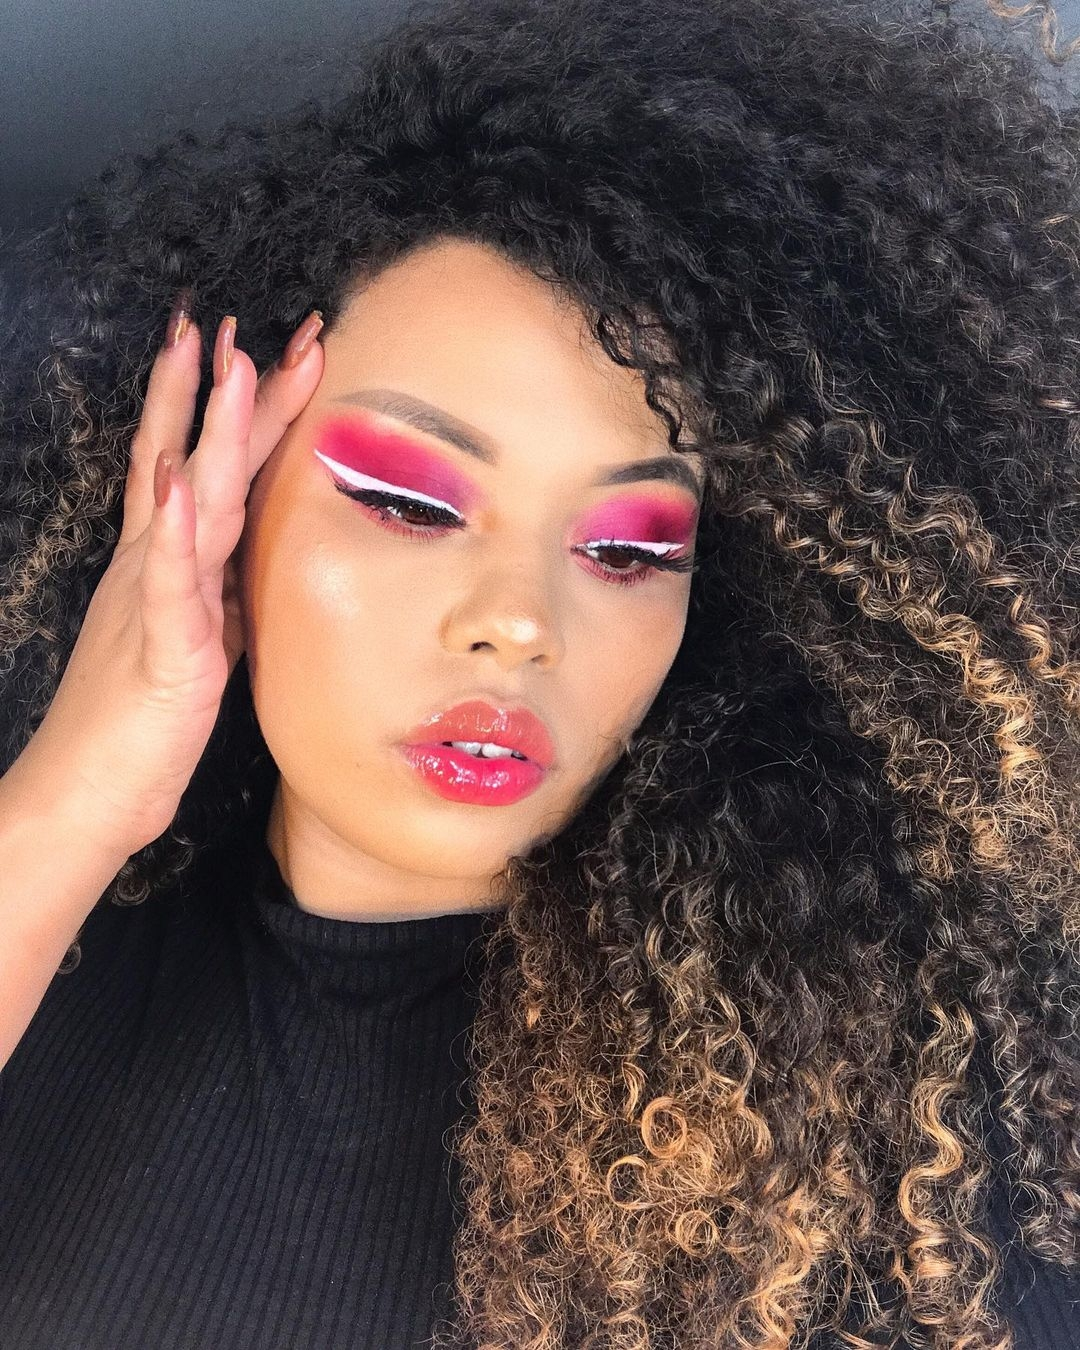 Make colorida rosa com delineado branco, cabelo cacheado iluminado